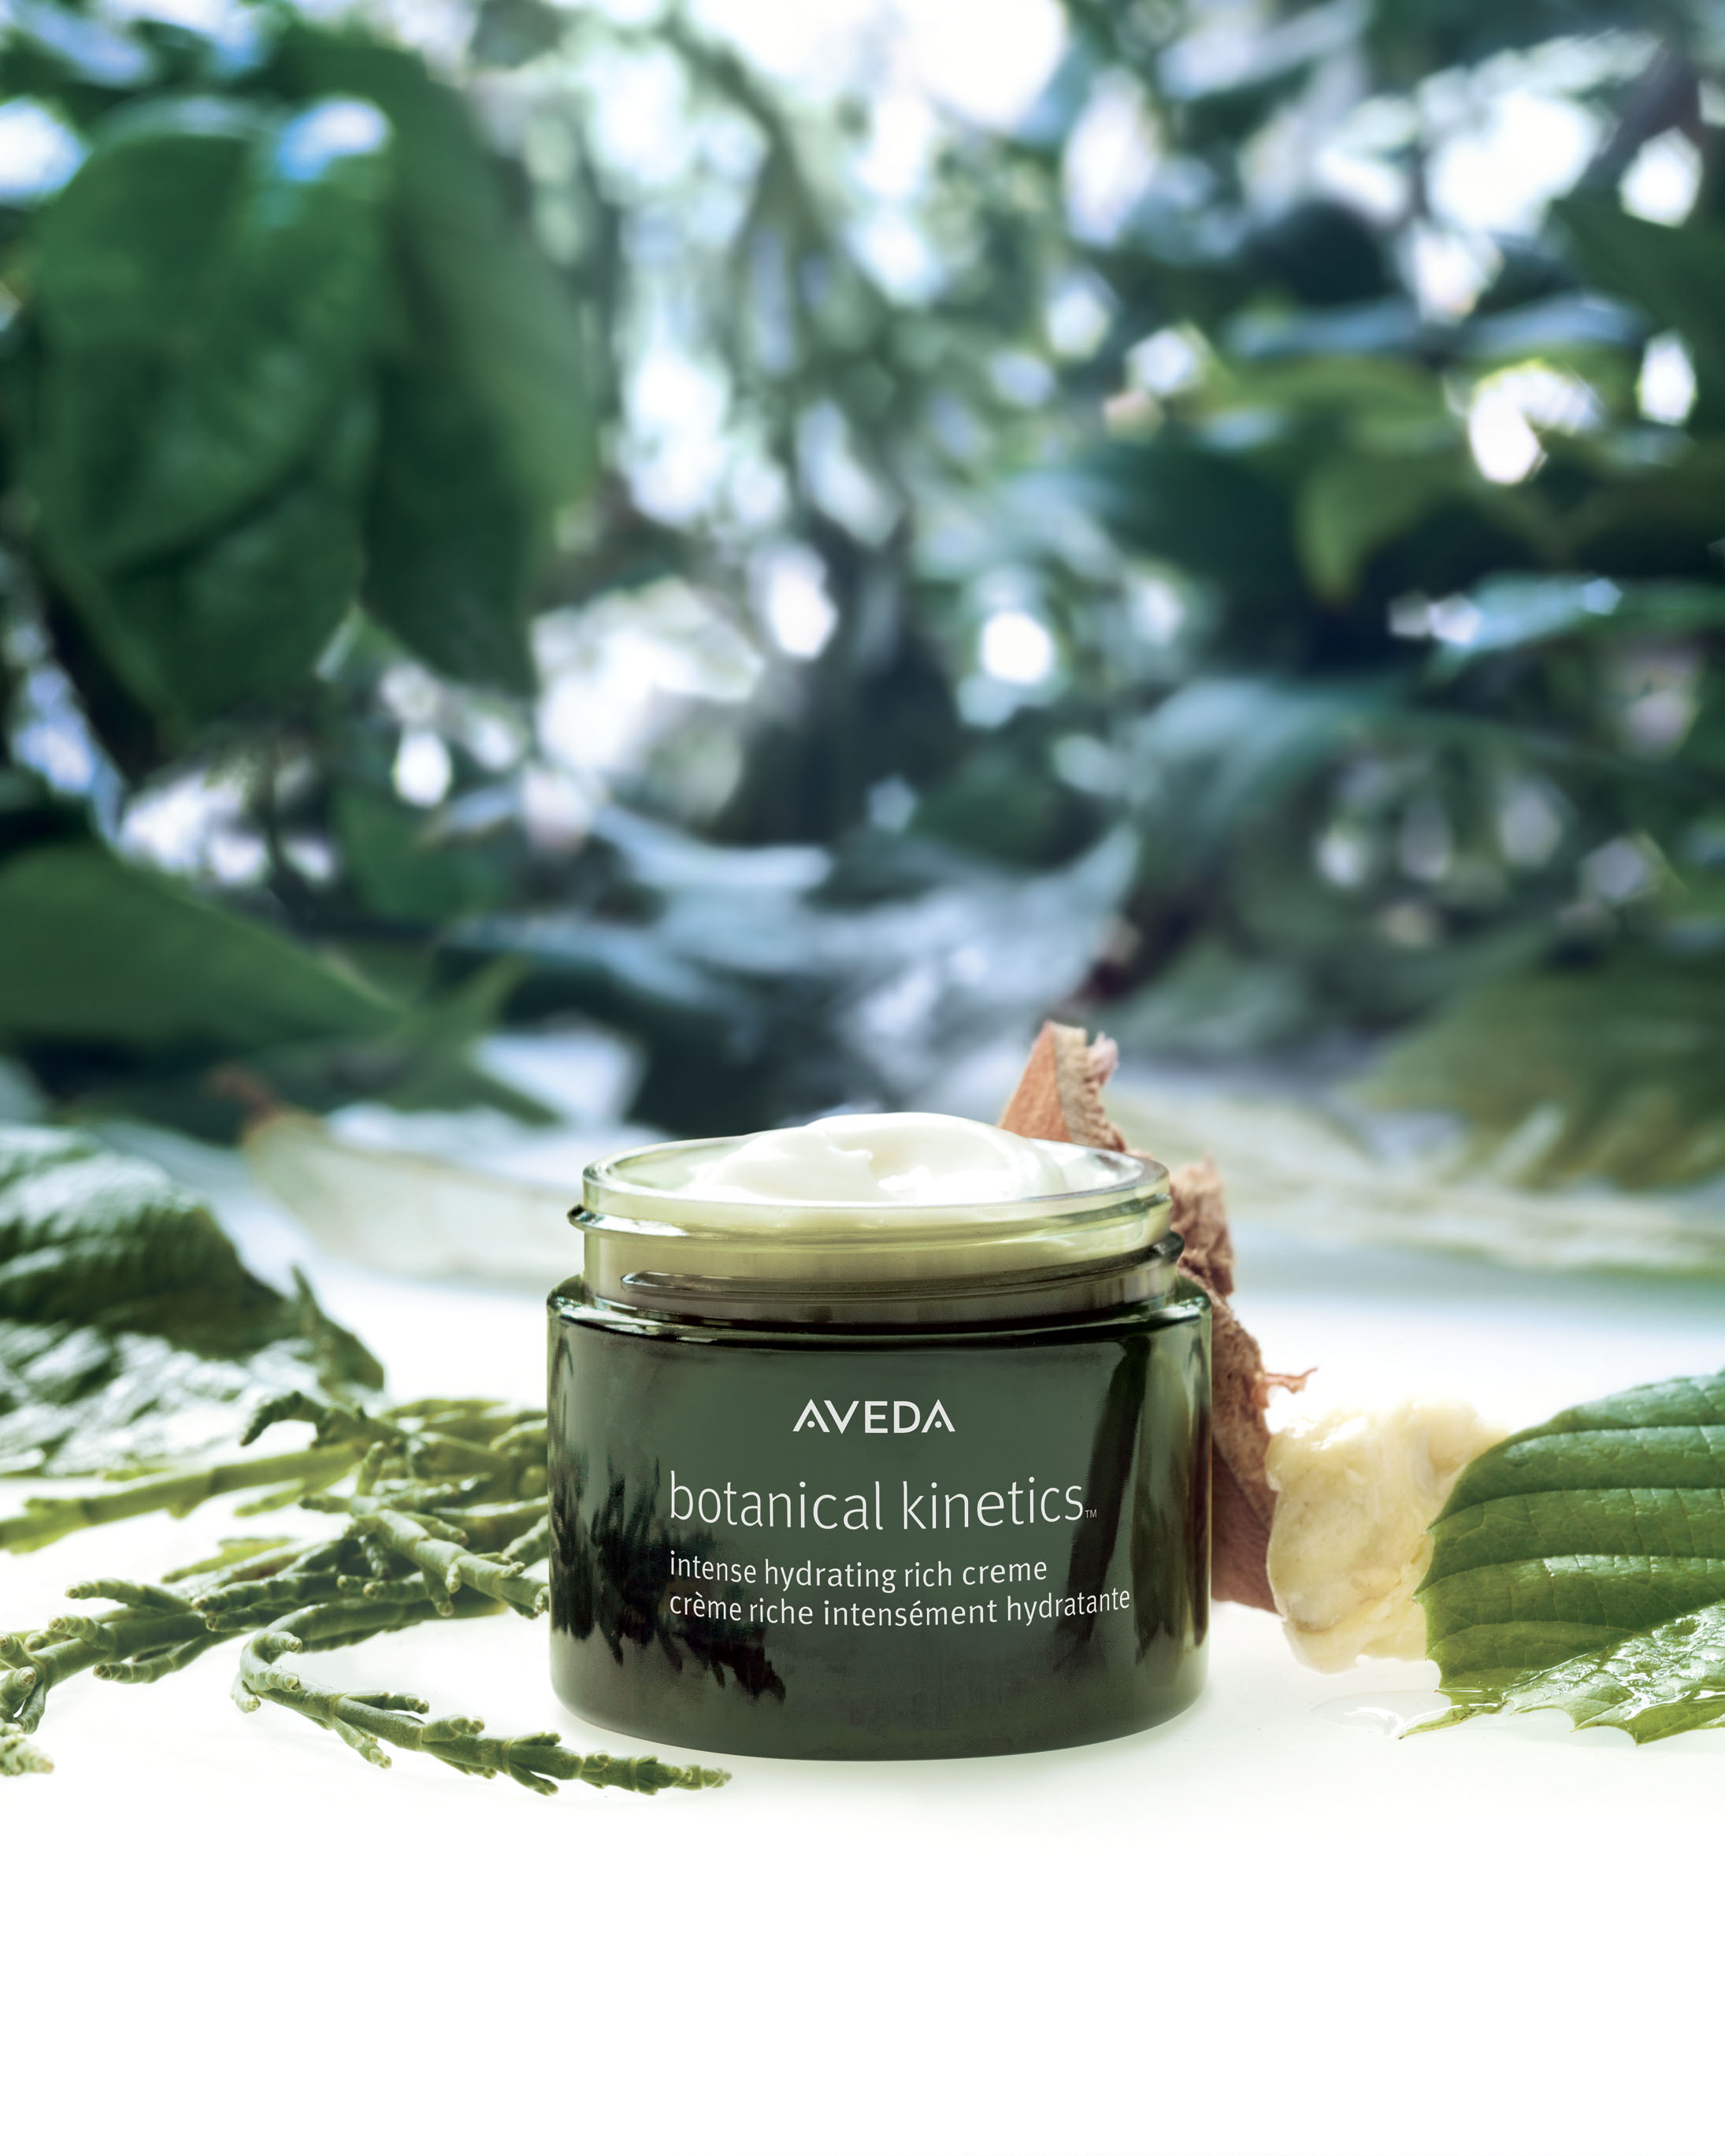 Botanical_Kinetics_Intense_Hydrating_Rich_Creme_stylized_product_image.jpg